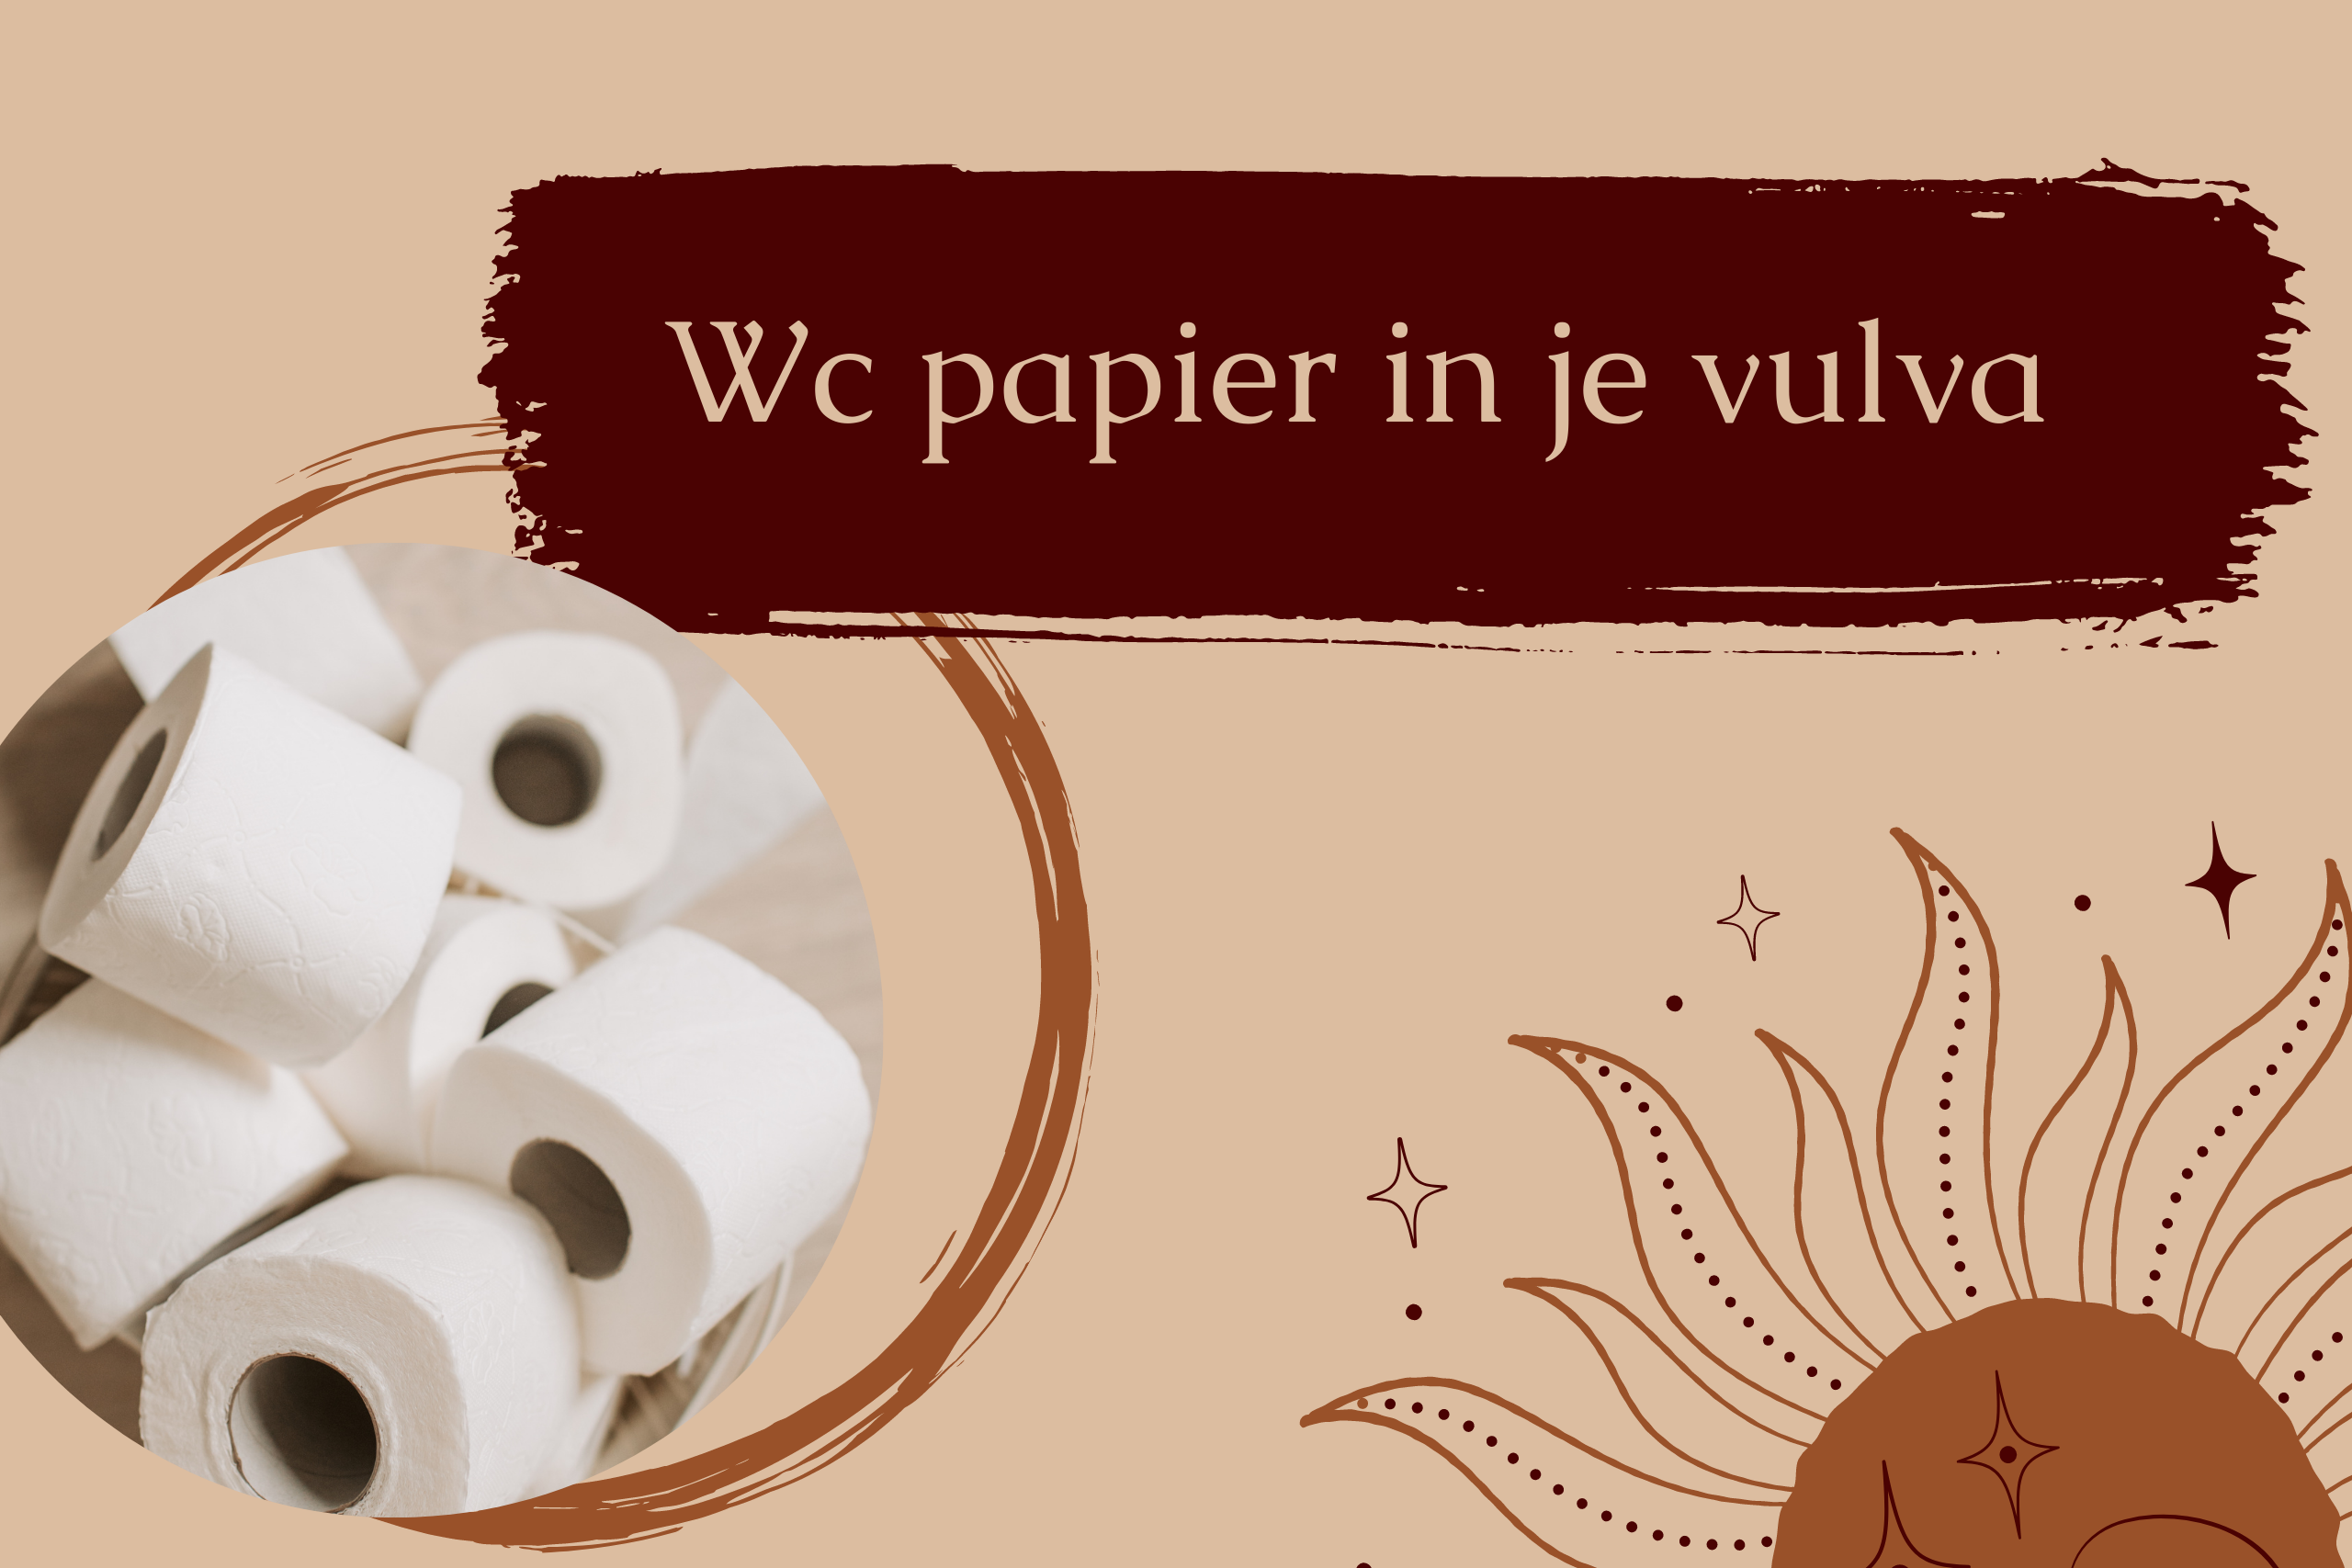 wc papier vulva